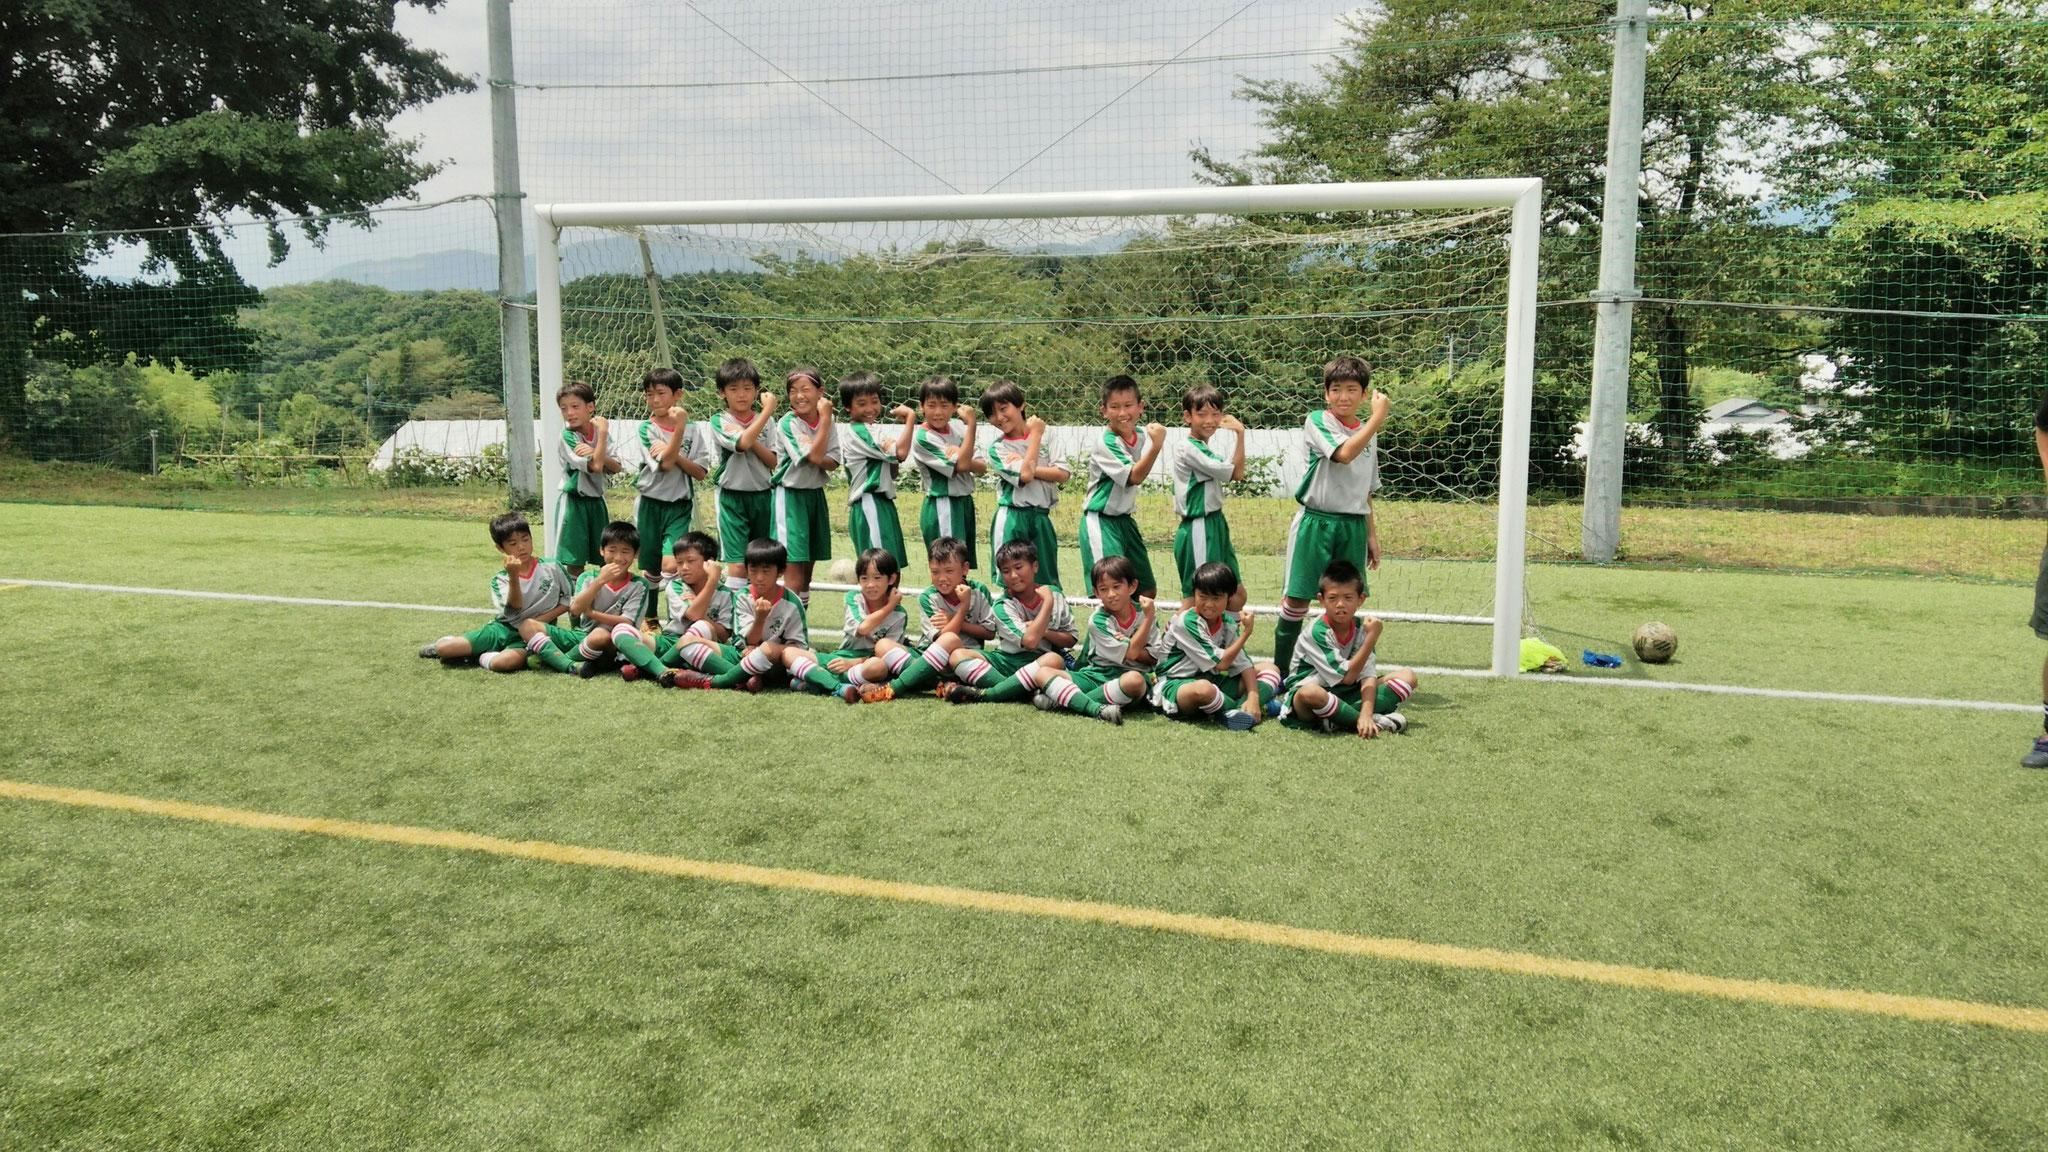 7/25 夏合宿3日目 横須賀シーガルFC U-11